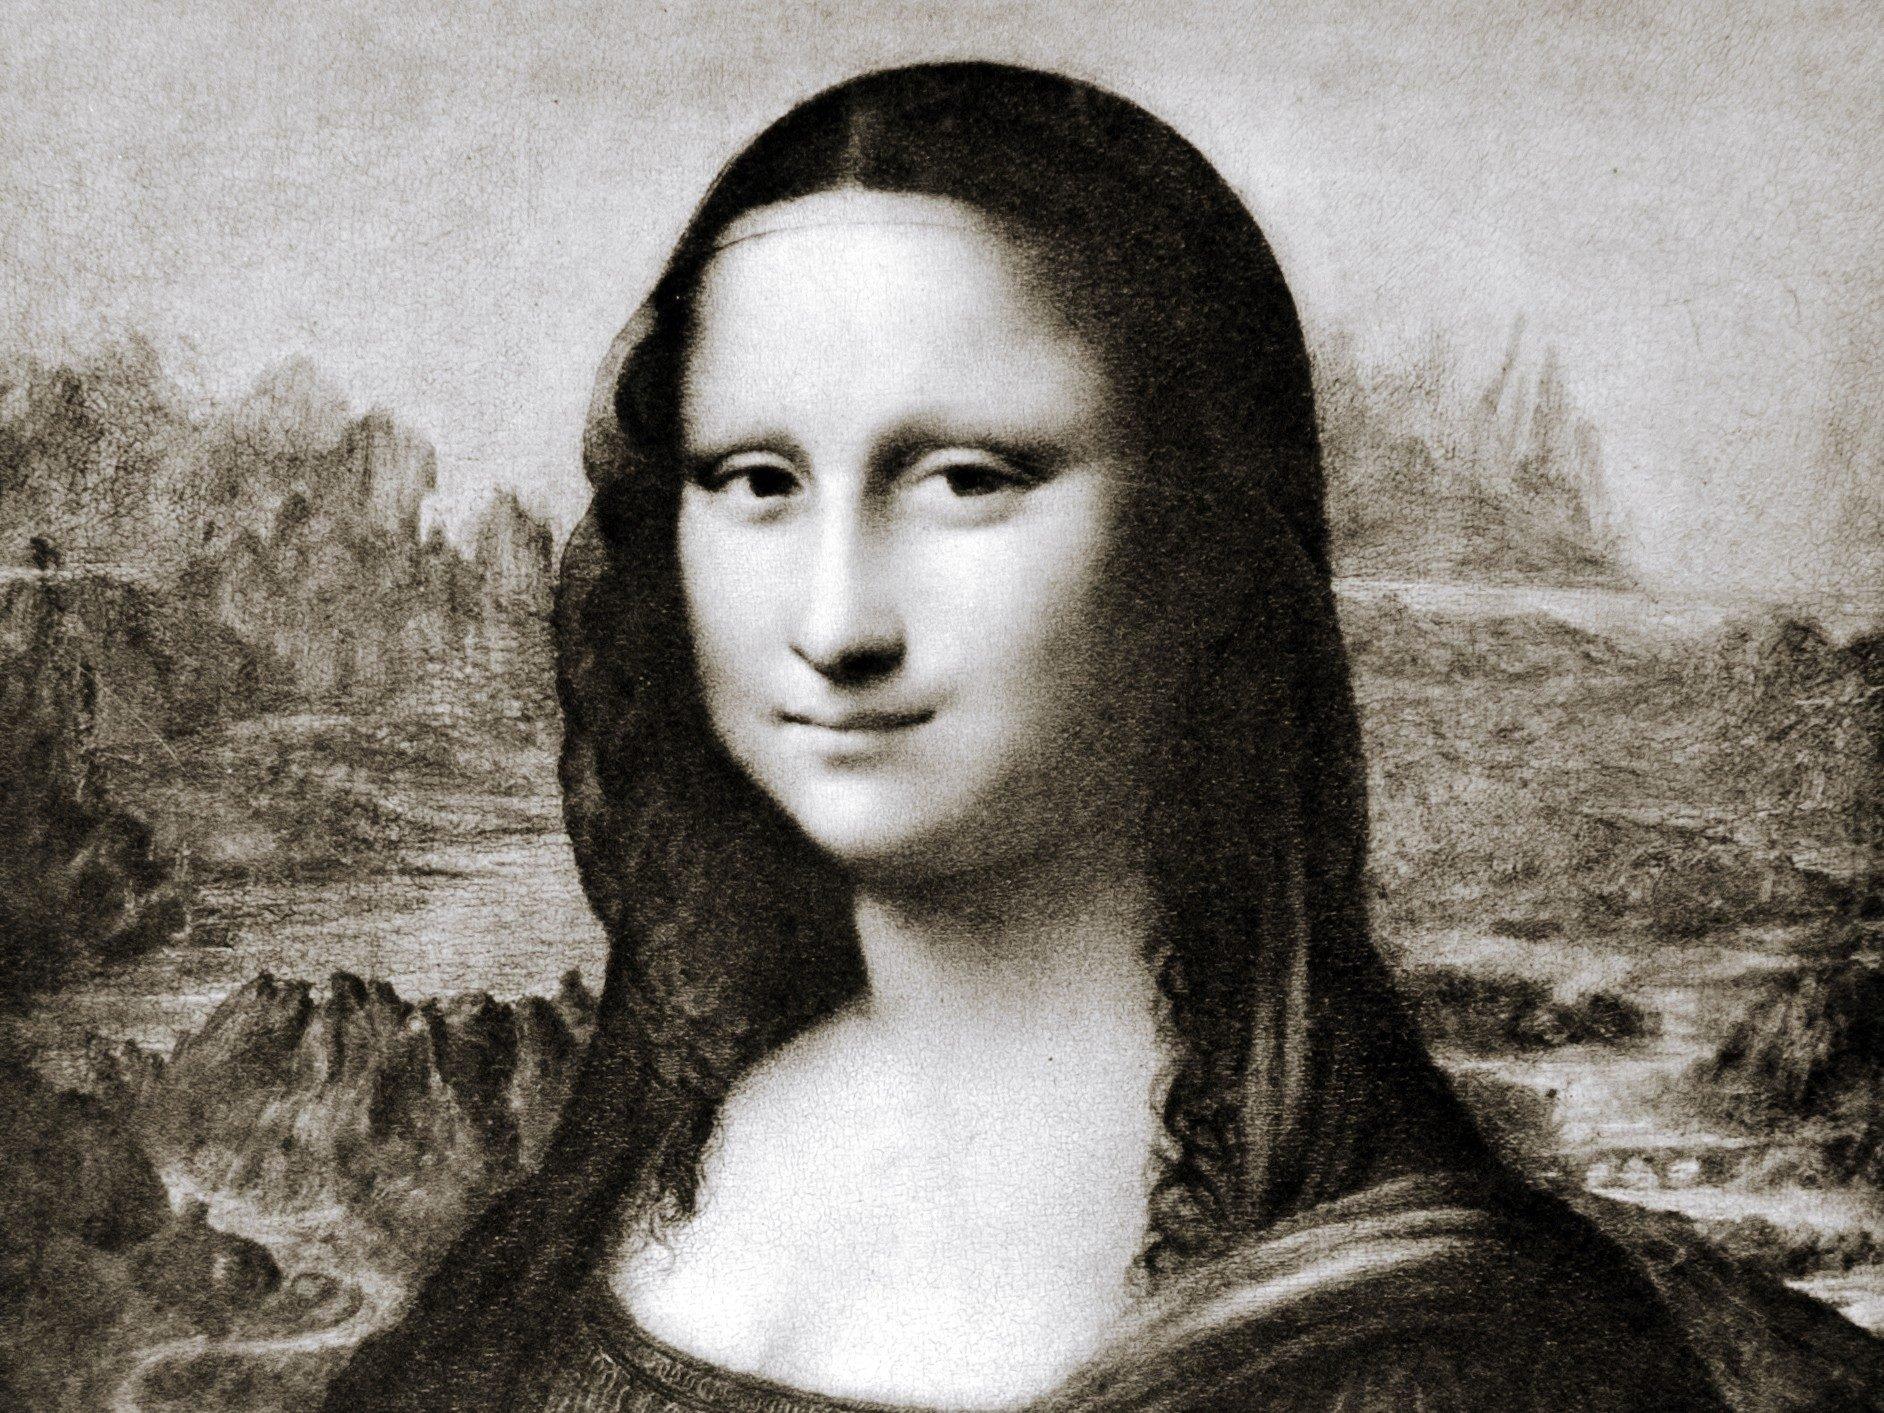 Mona Lisa mystery #3: The broken backdrop.